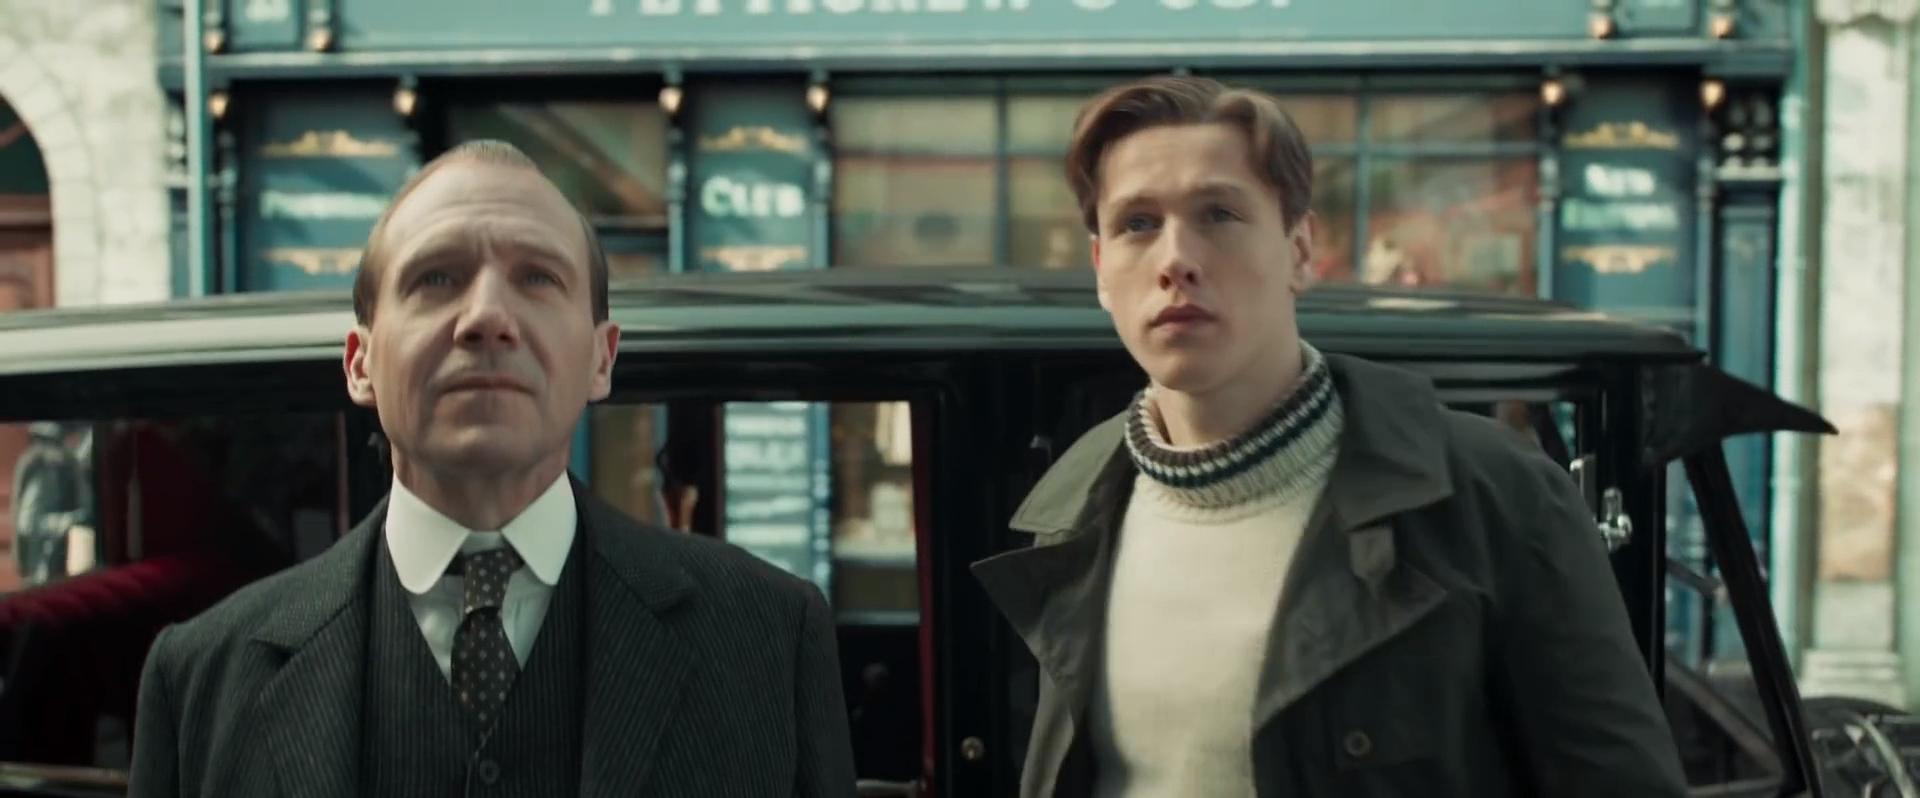 The King's Man (2021) - IMDb